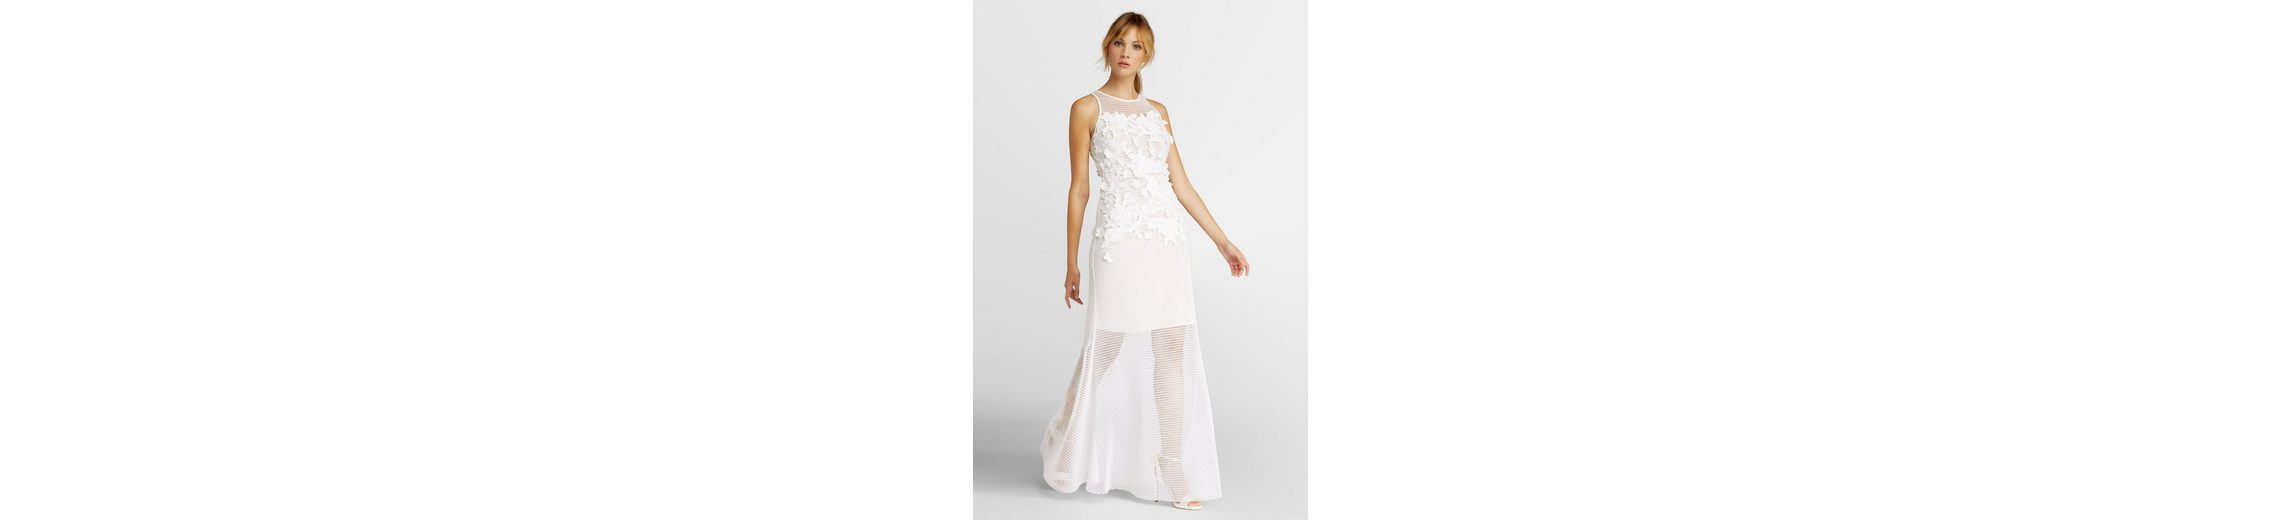 Günstig Kaufen Blick Apart Kleid Rabatt Footaction 1RTVuoRB